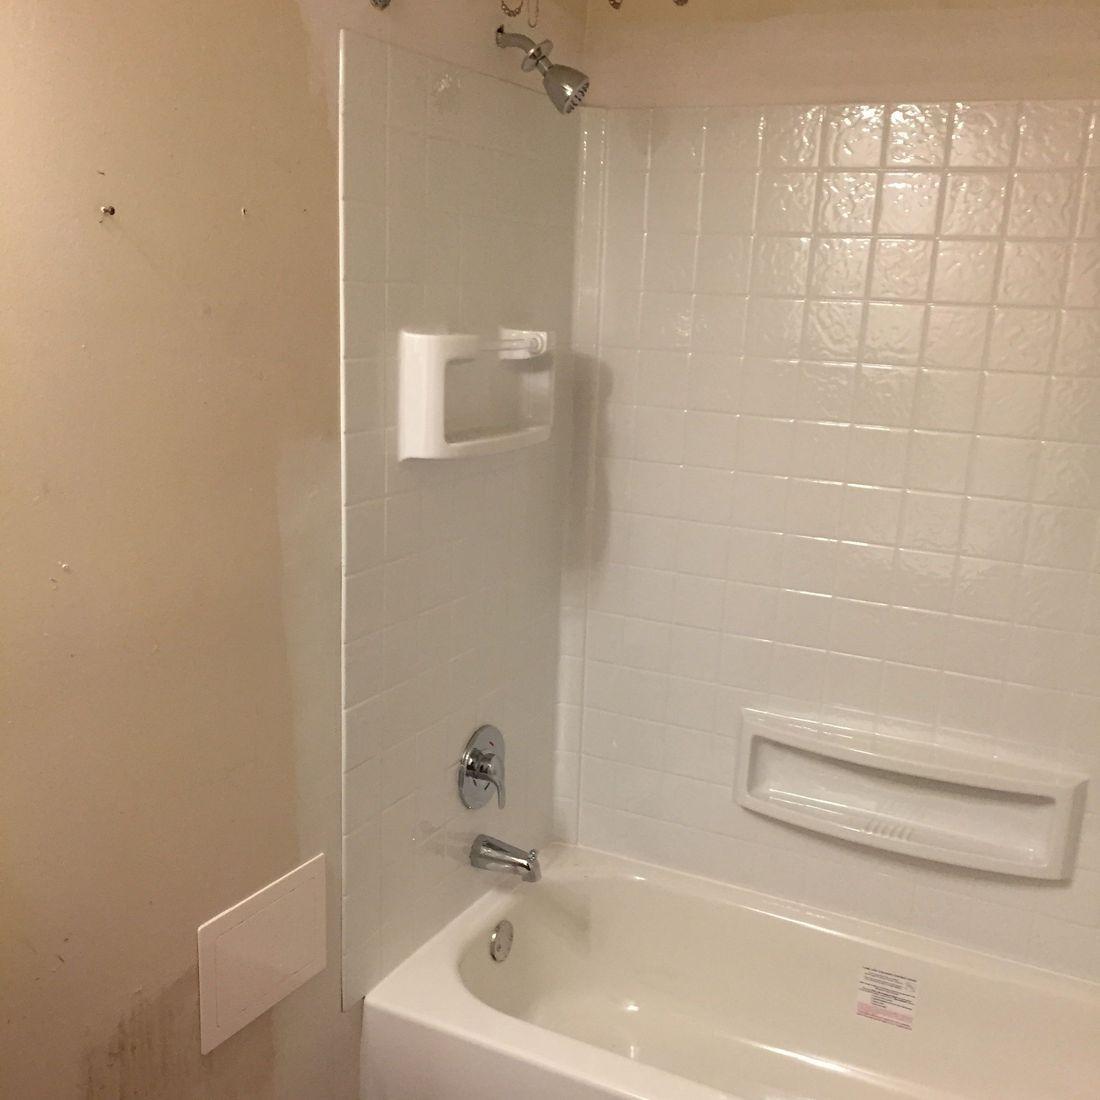 New Tub & Glue Up Tub Surround Installation